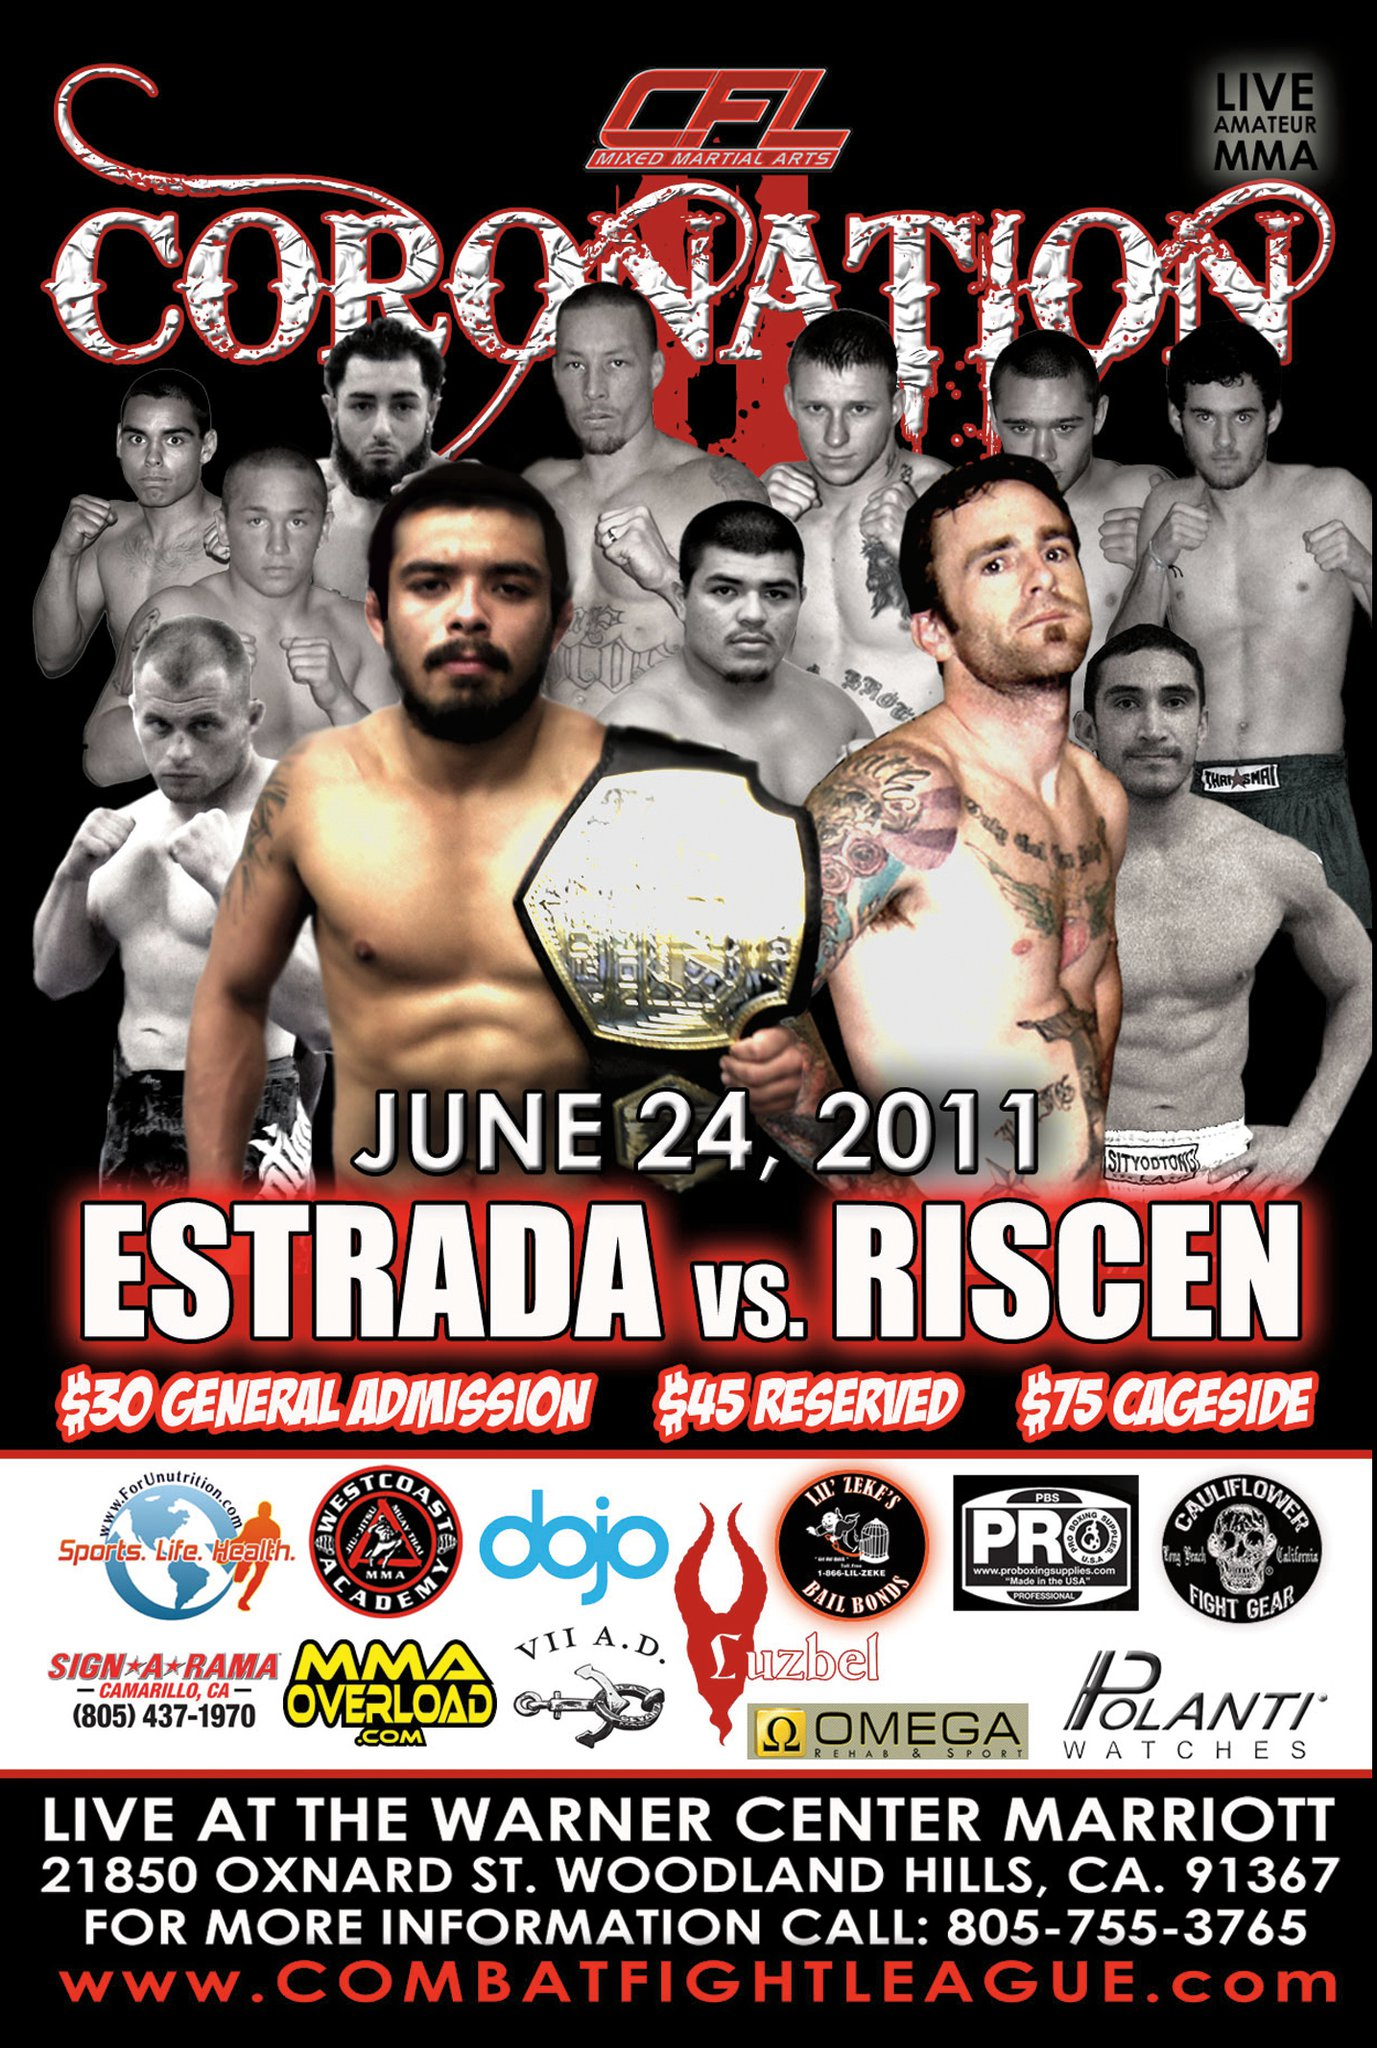 Tim Riscen fights tonight! — Morumbi Jiu Jitsu and Fitness Academy